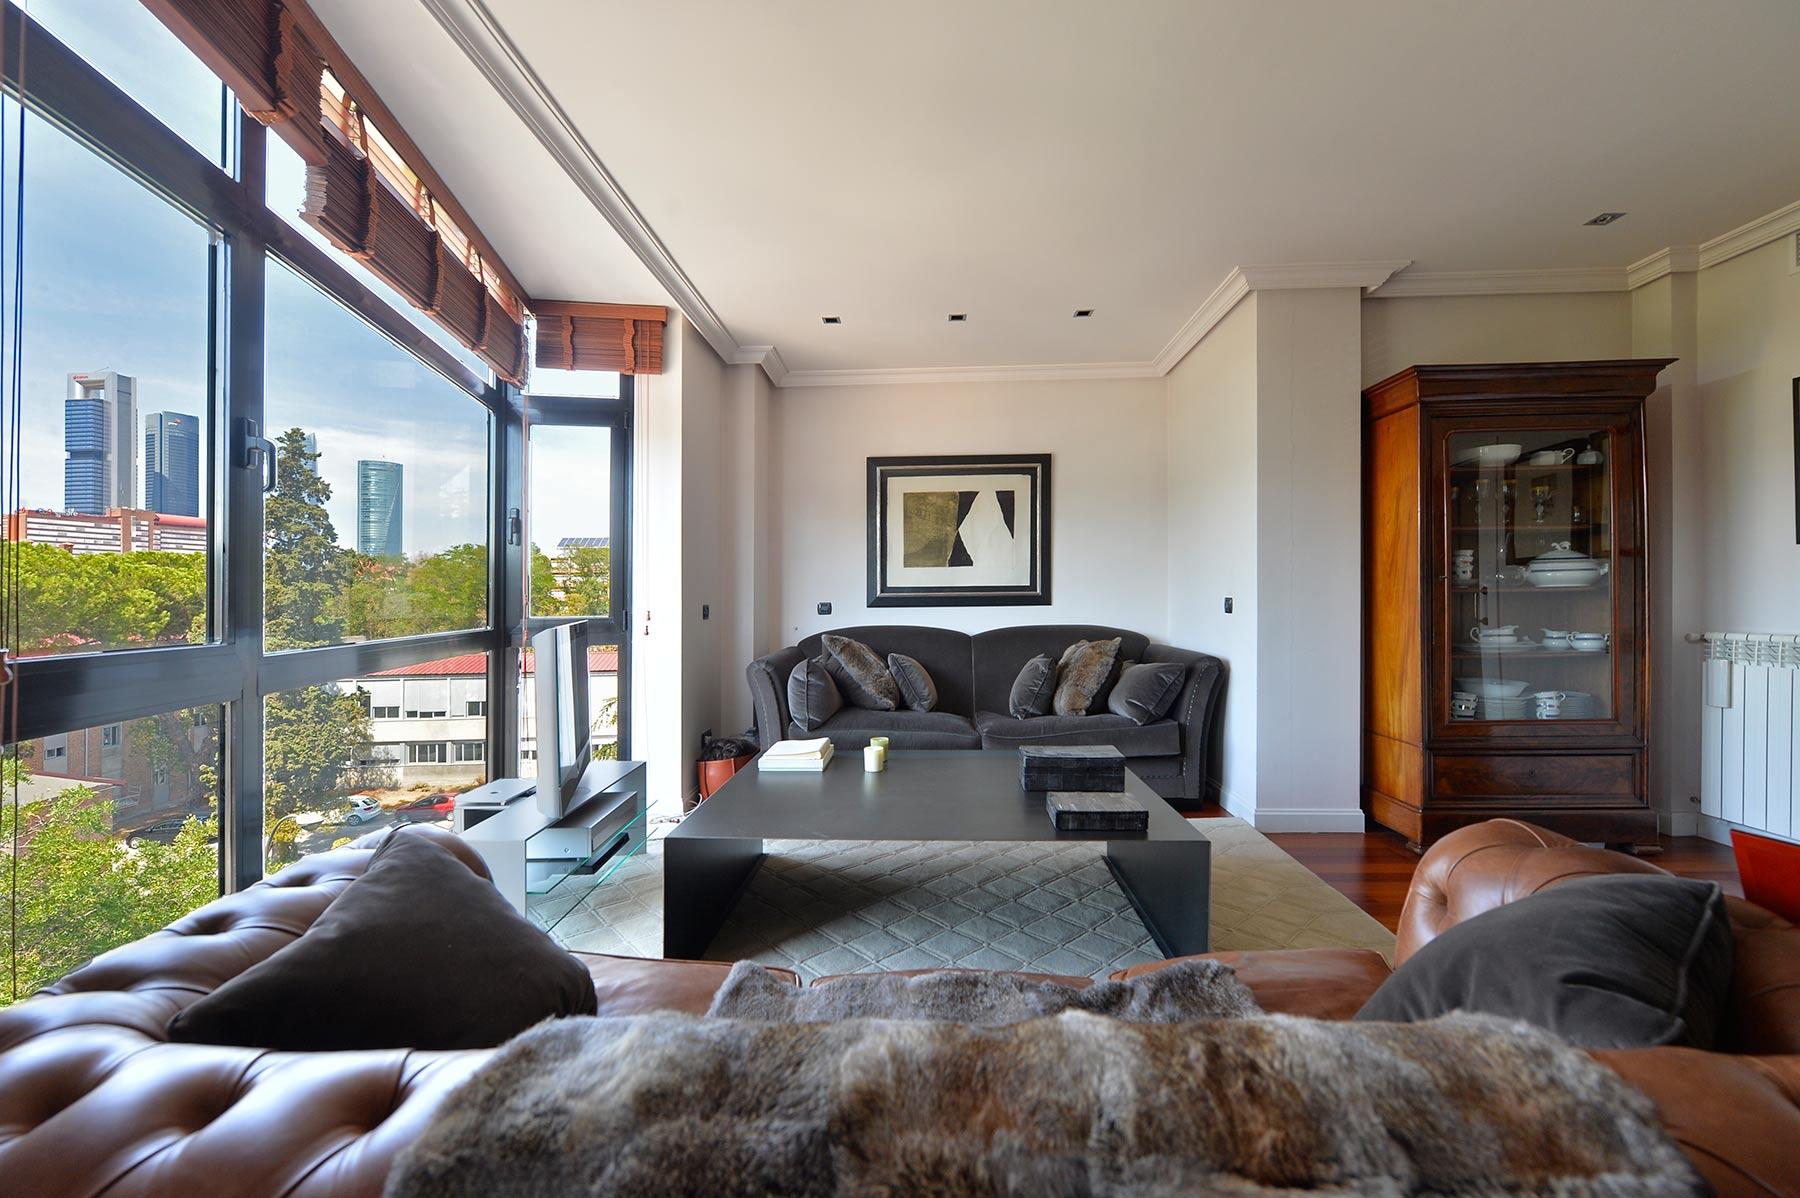 Apartment for Sale at Excelente piso en zona residencial de Madrid Madrid, Madrid, Spain